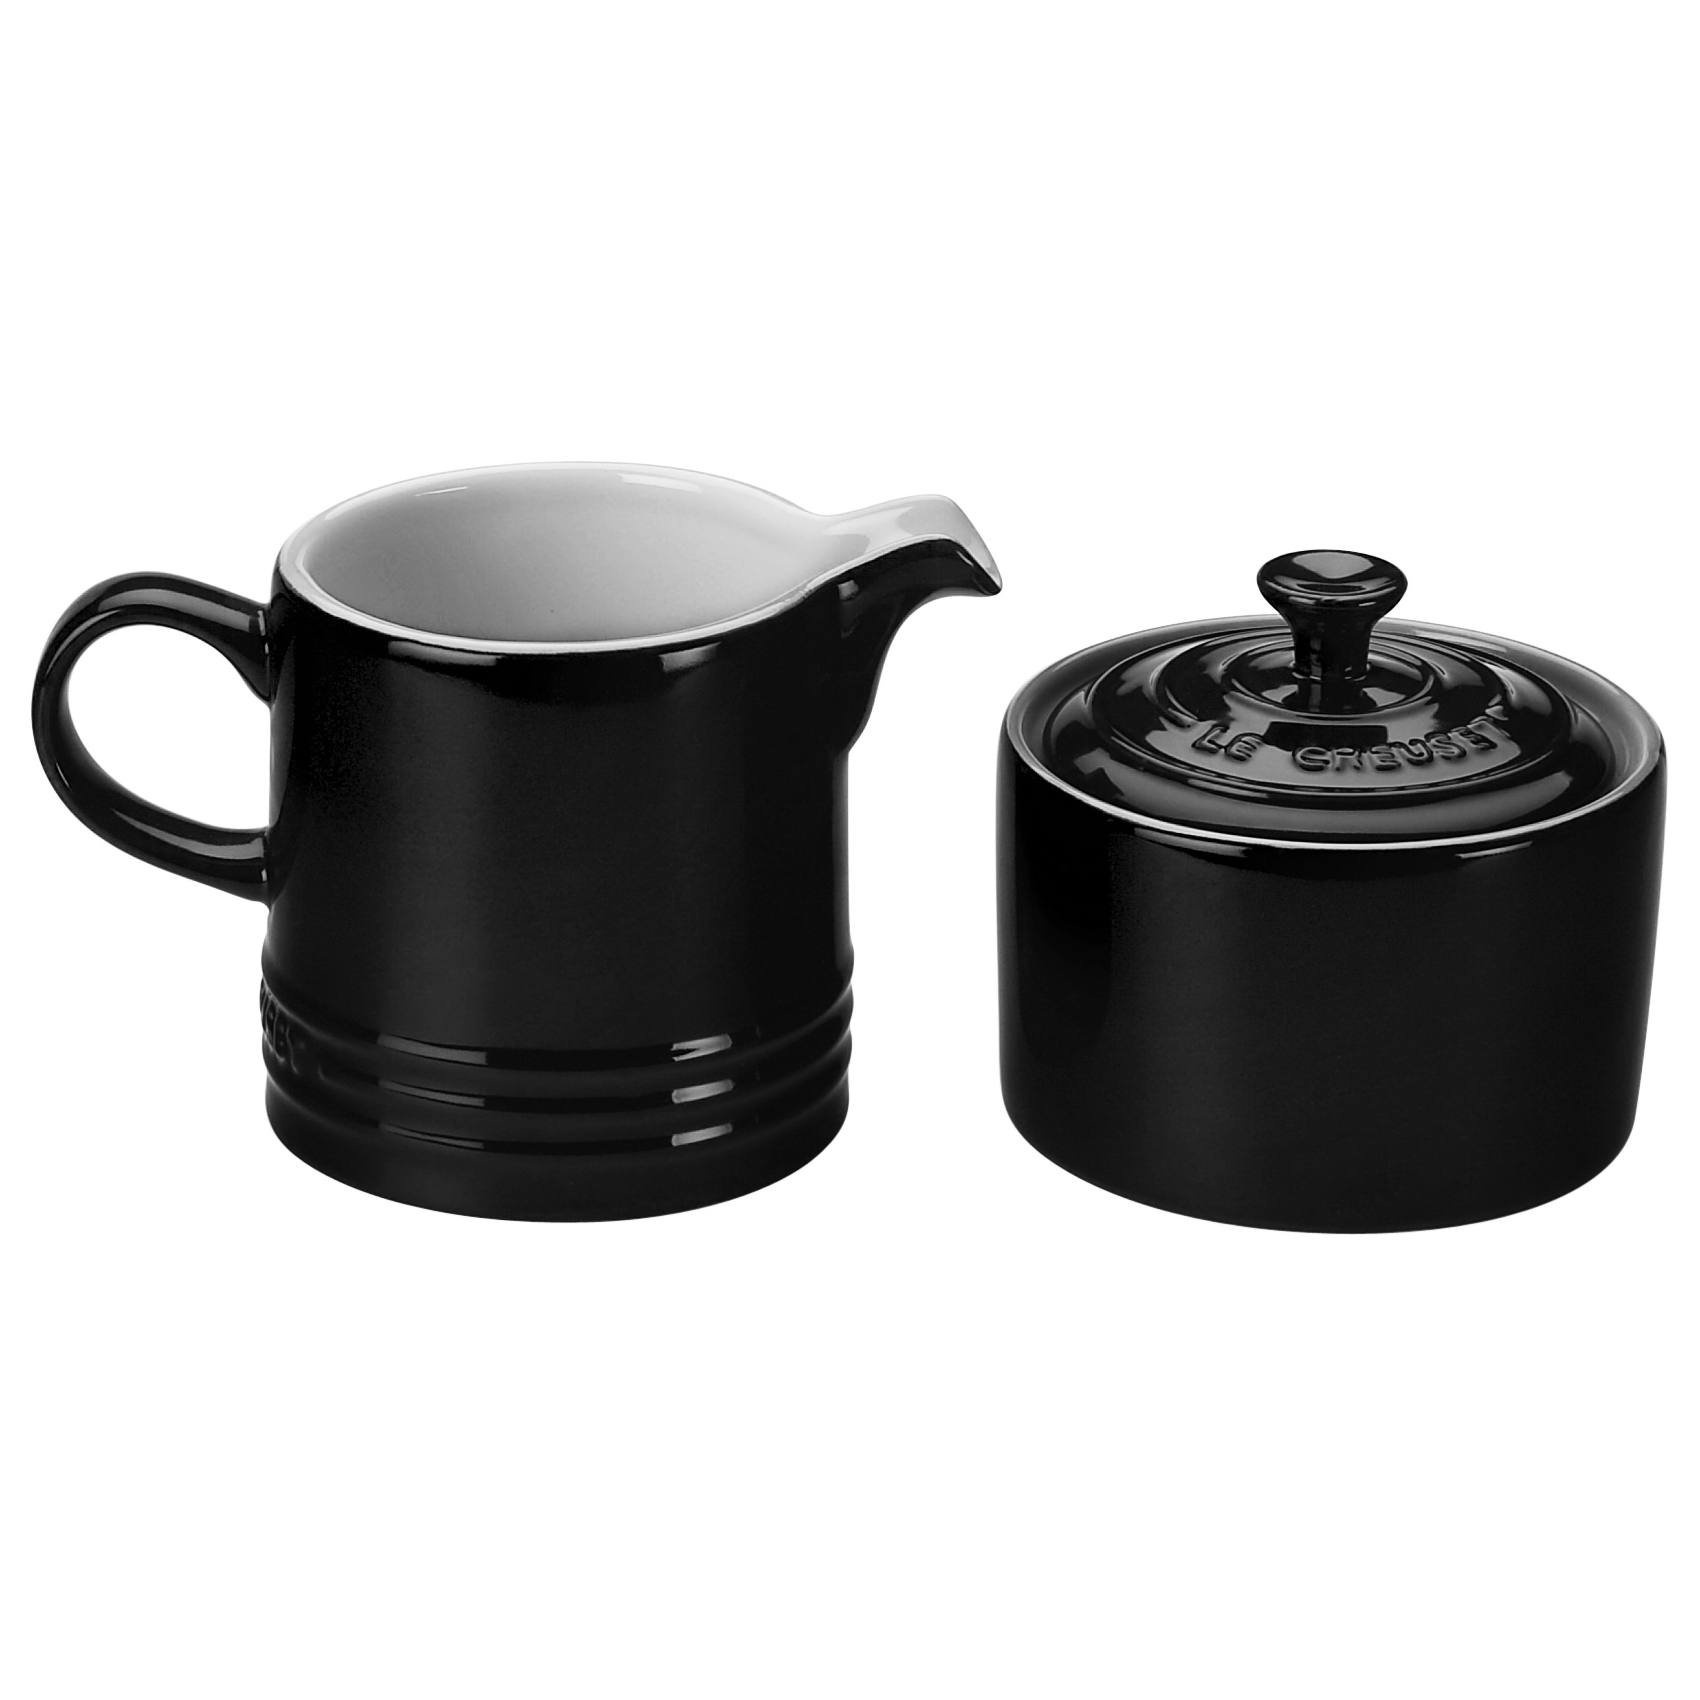 Le Creuset Black Onyx Stoneware Cream and Sugar Set